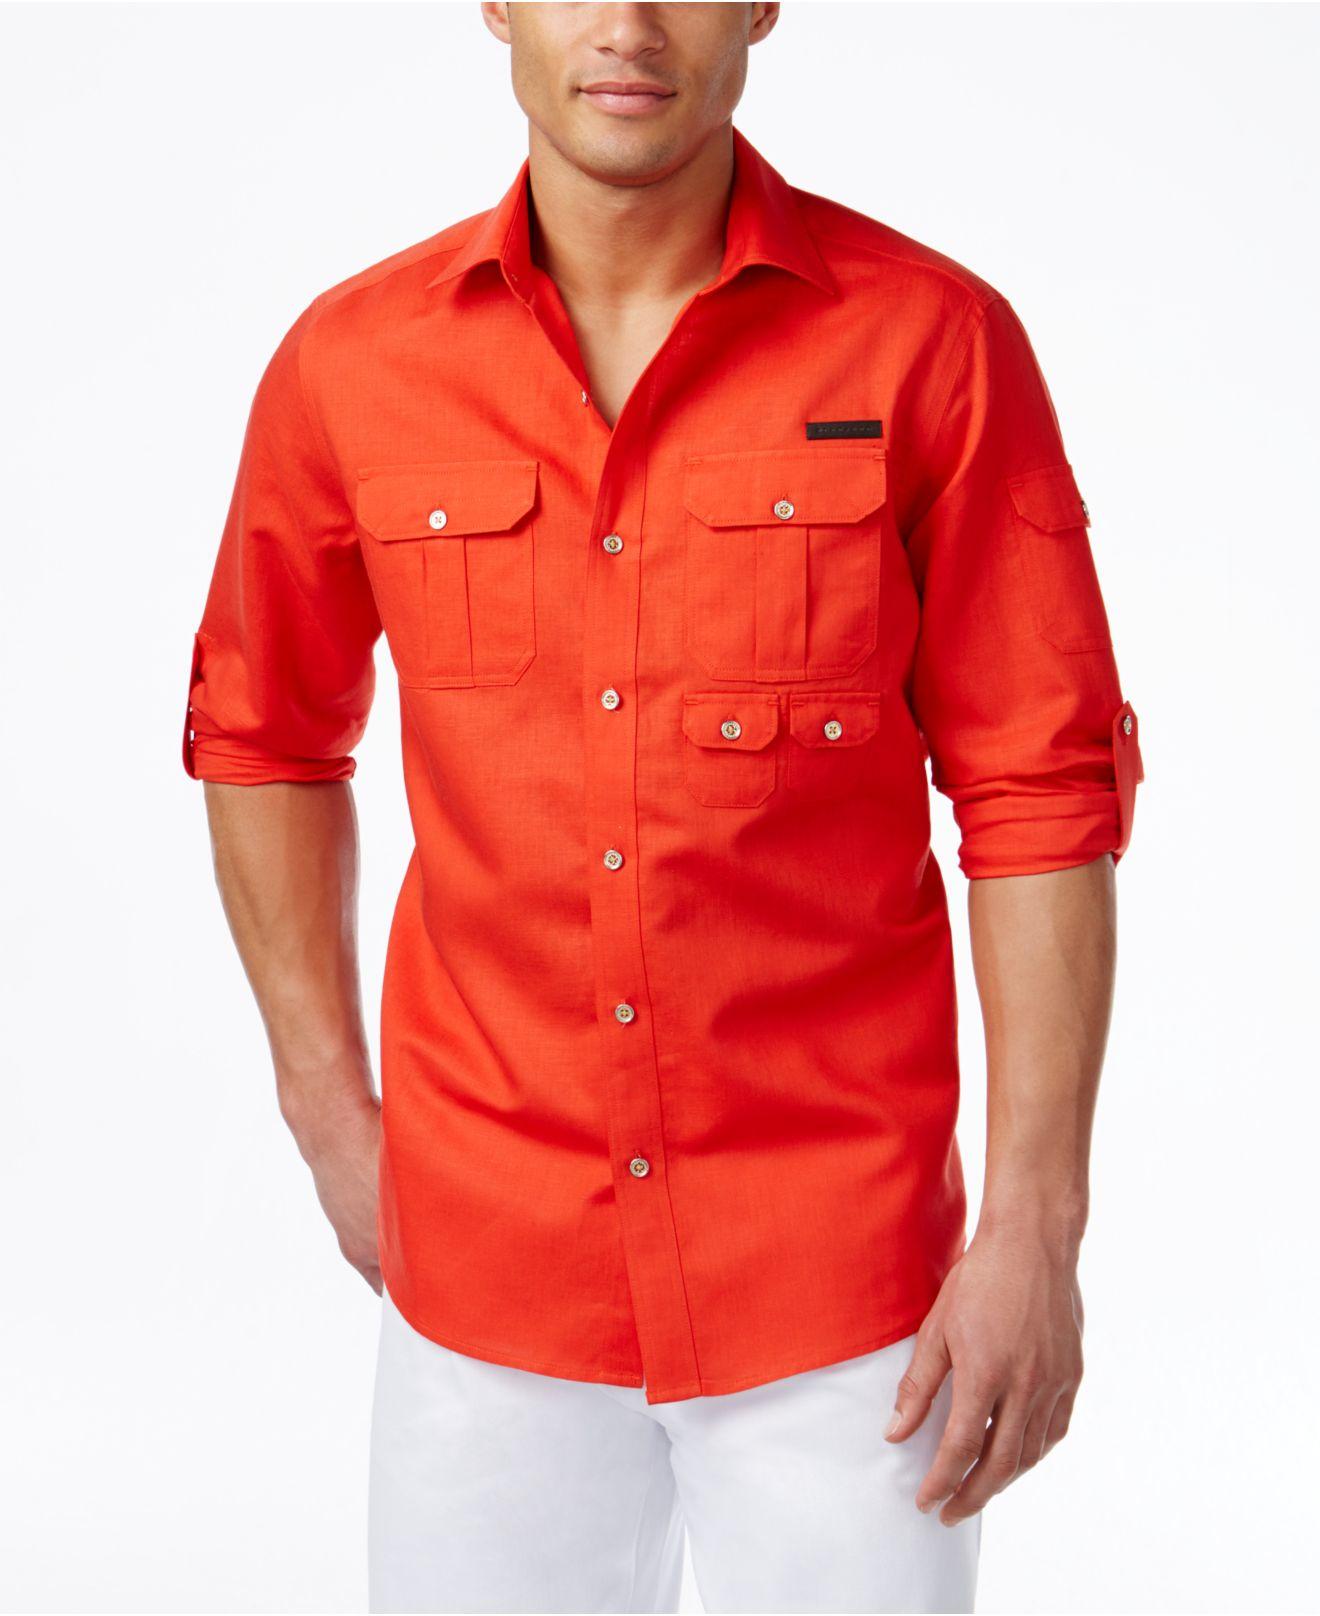 Lyst sean john men 39 s linen flight shirt in red for men for Sean john t shirts for mens